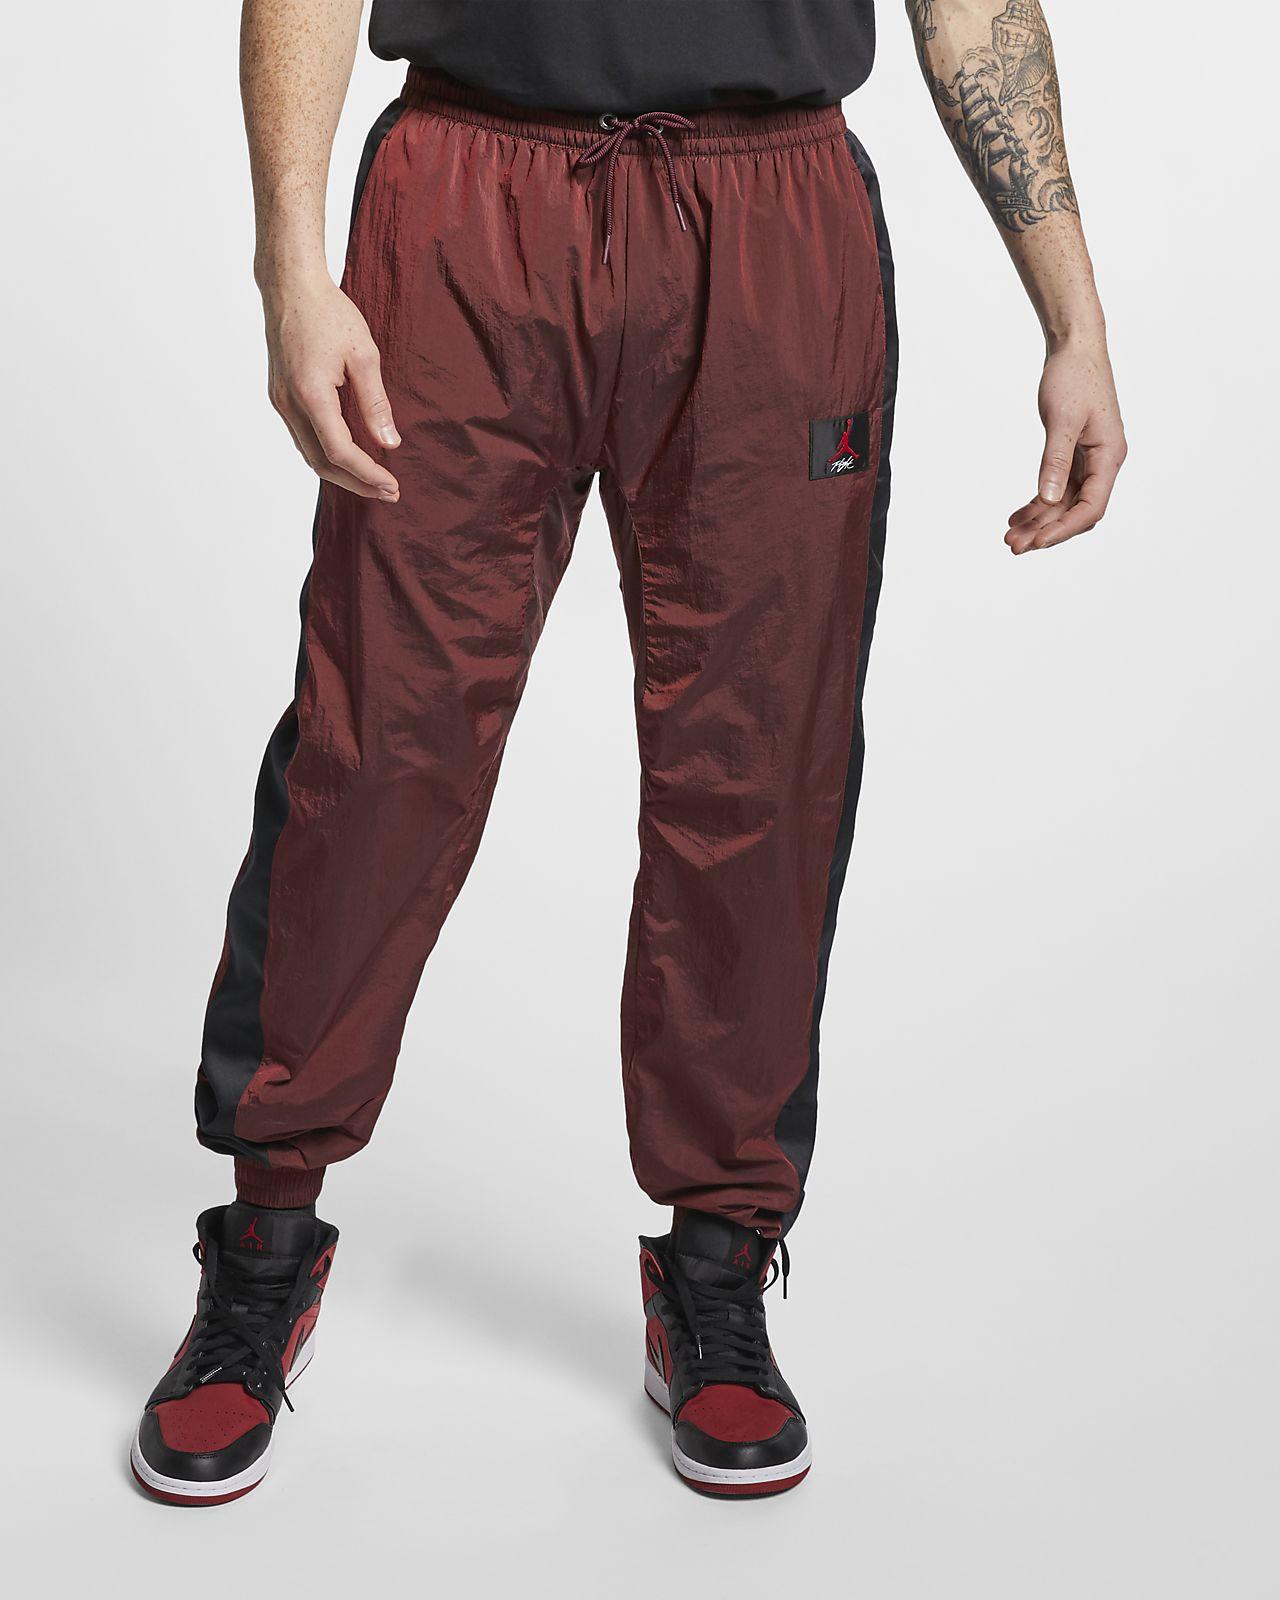 c2fac4dd1de0da Jordan Flight Warm-Up Trousers. Nike.com GB